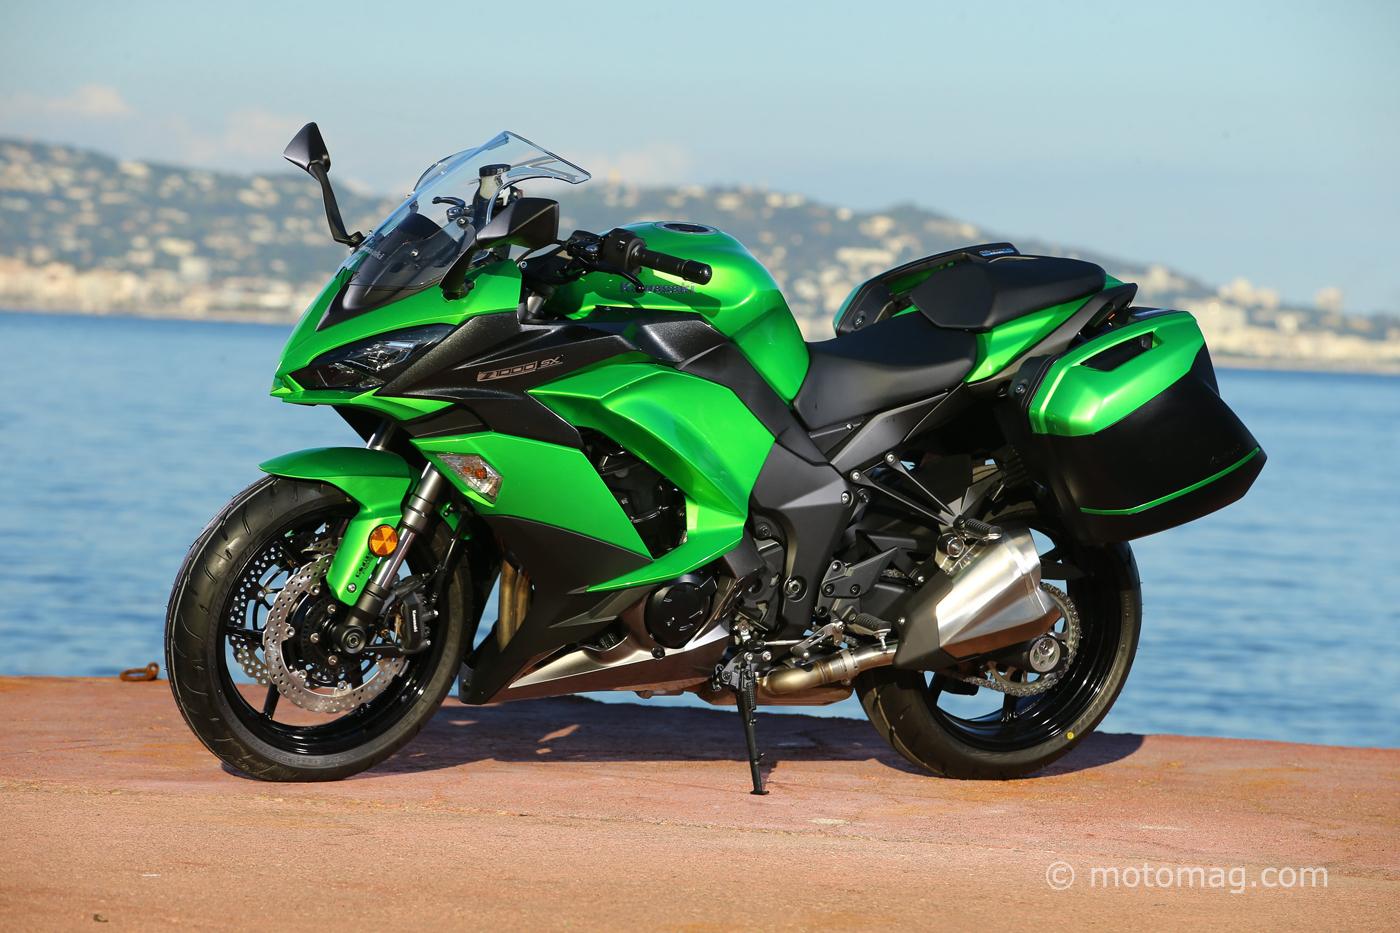 Kawasaki Z 1000 SX 2017 : Tourisme Décomplexé